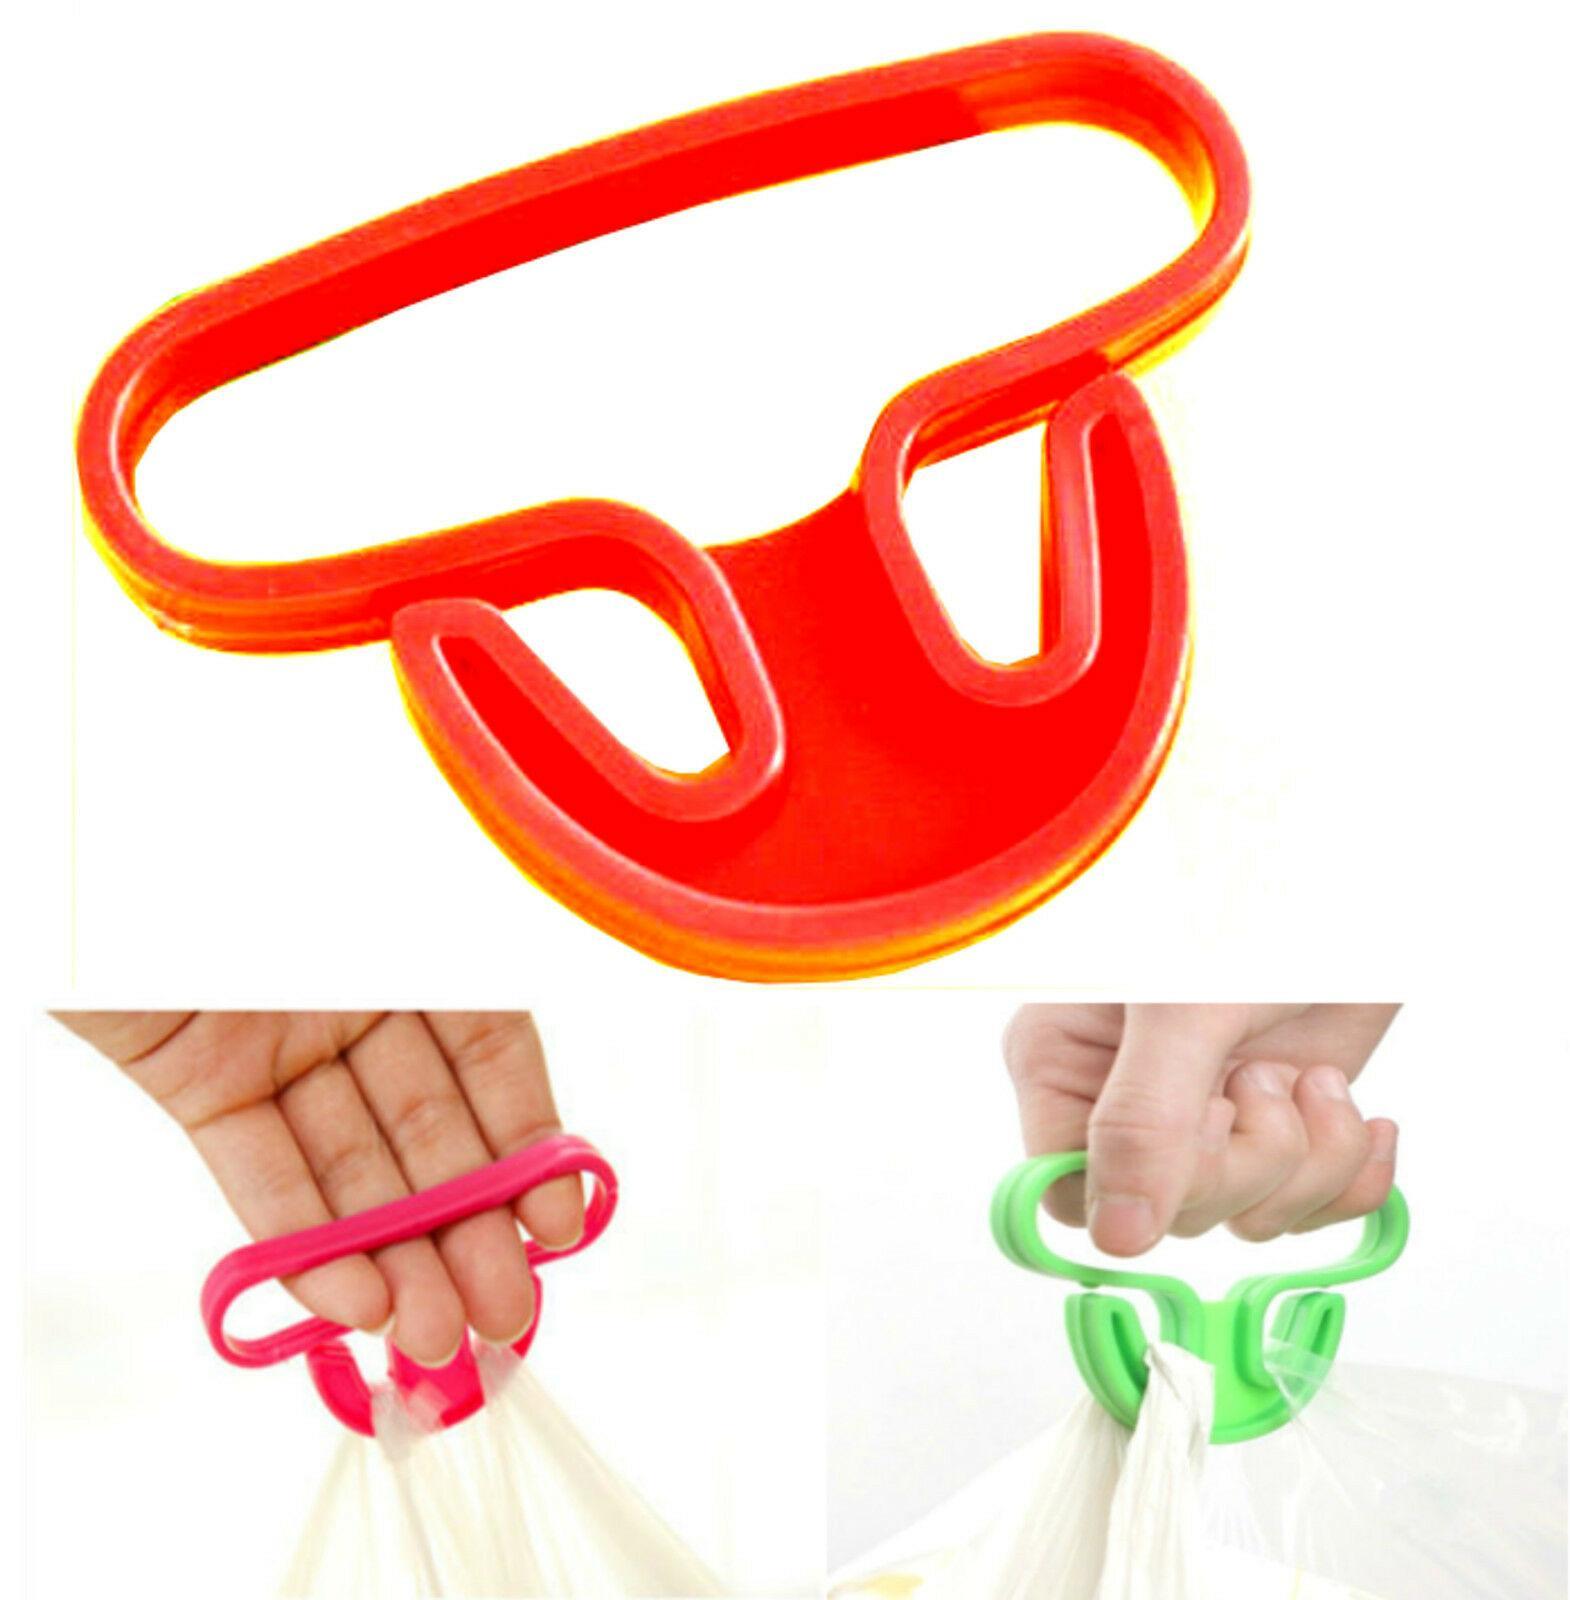 Multi Shopping Bag Carrier Easy Lifter Holder Plastic Grip Bag Handle